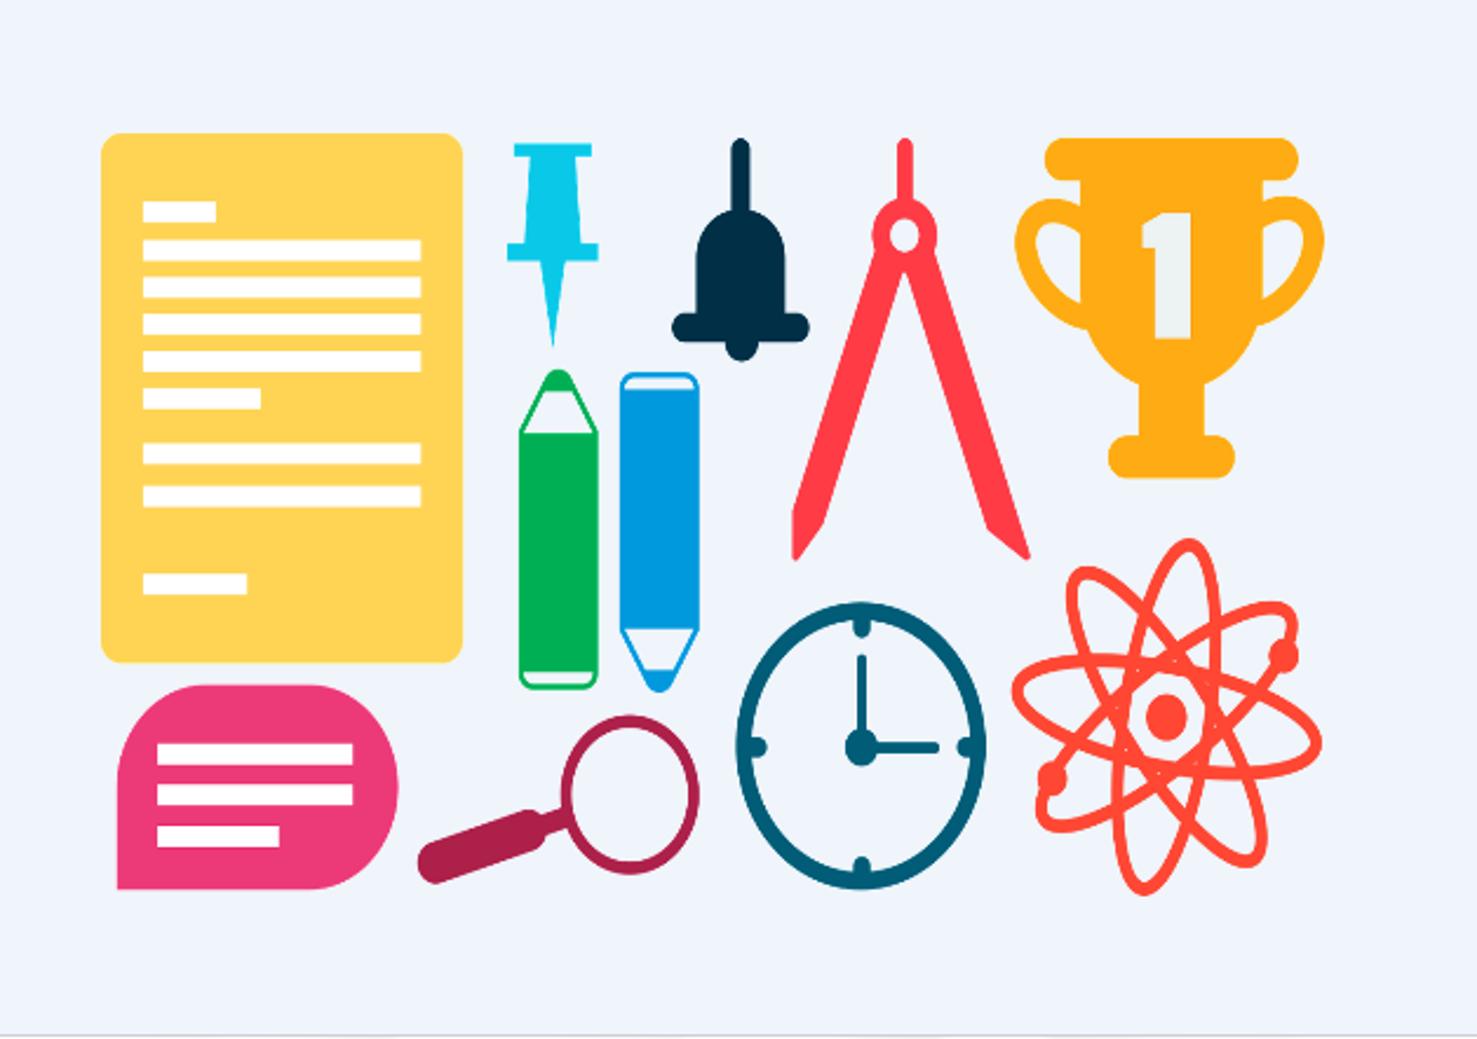 Produktentwicklung: Kollektionsrahmenplan, Sortiment, Prozesse, Dokumente, Prototypen, Prozesscontrolling, PDM, PLM